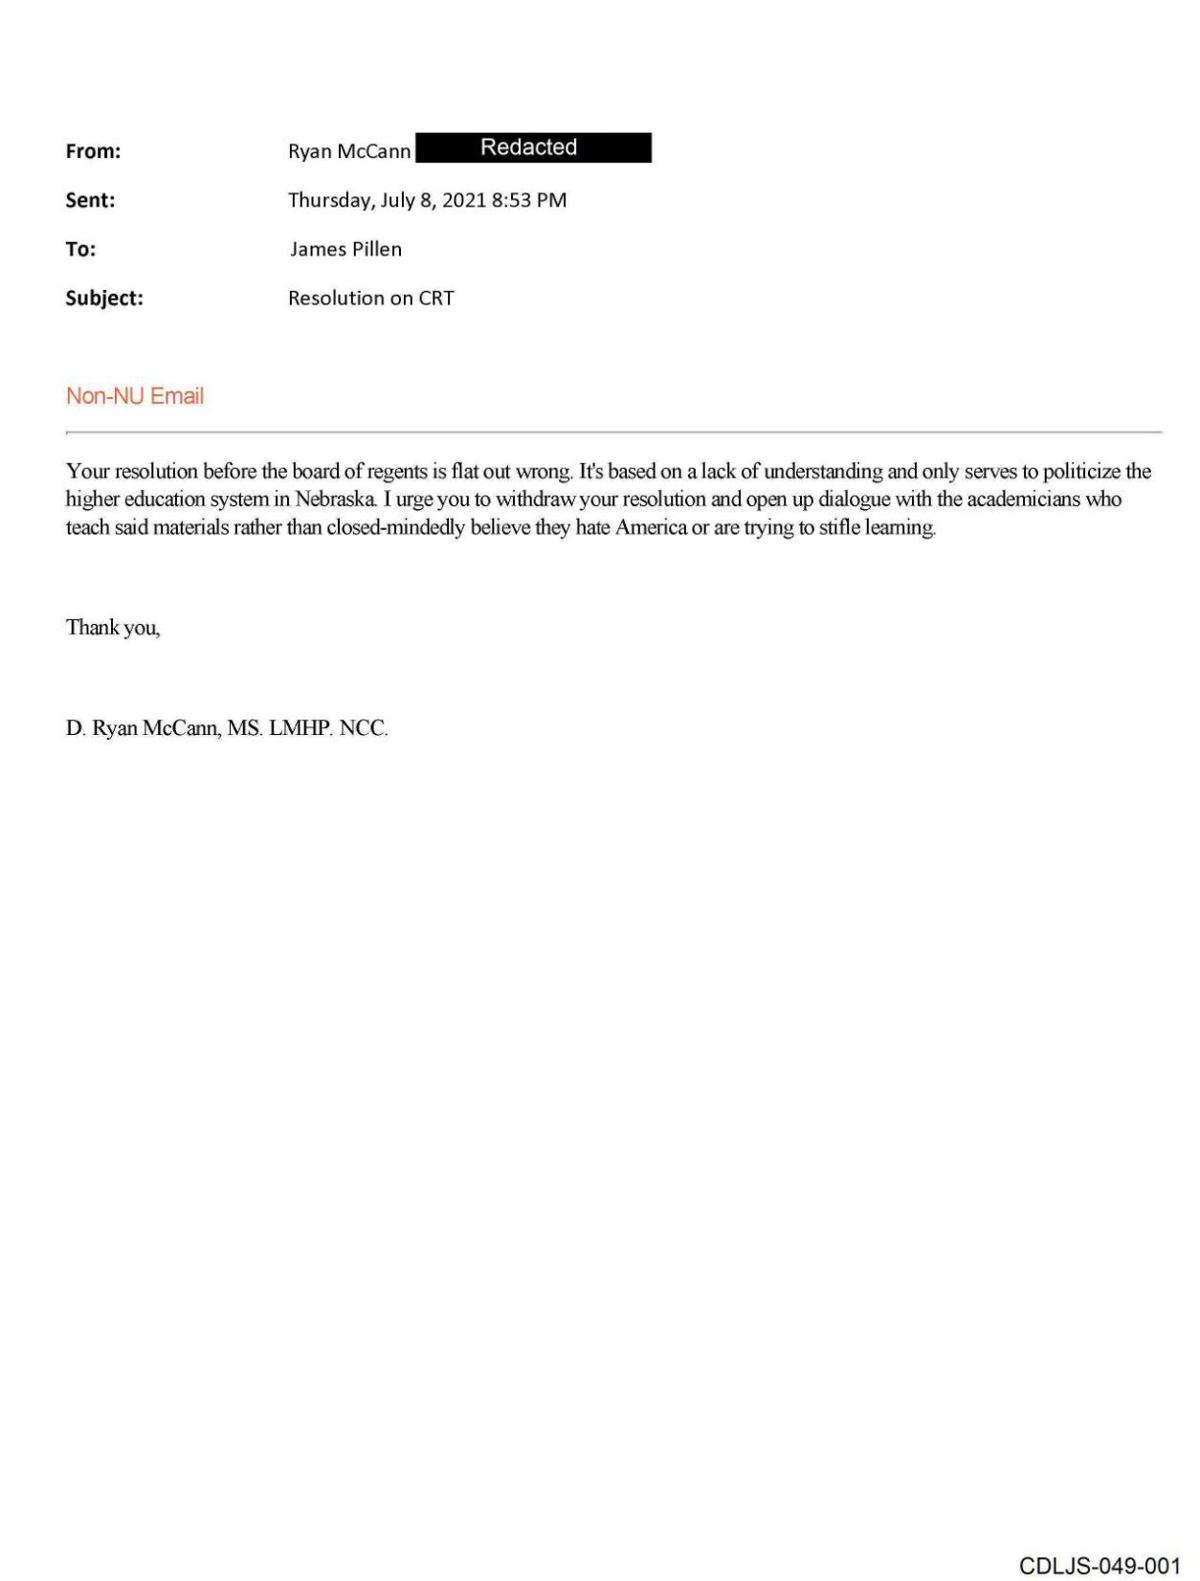 CDLJS-049-001.pdf